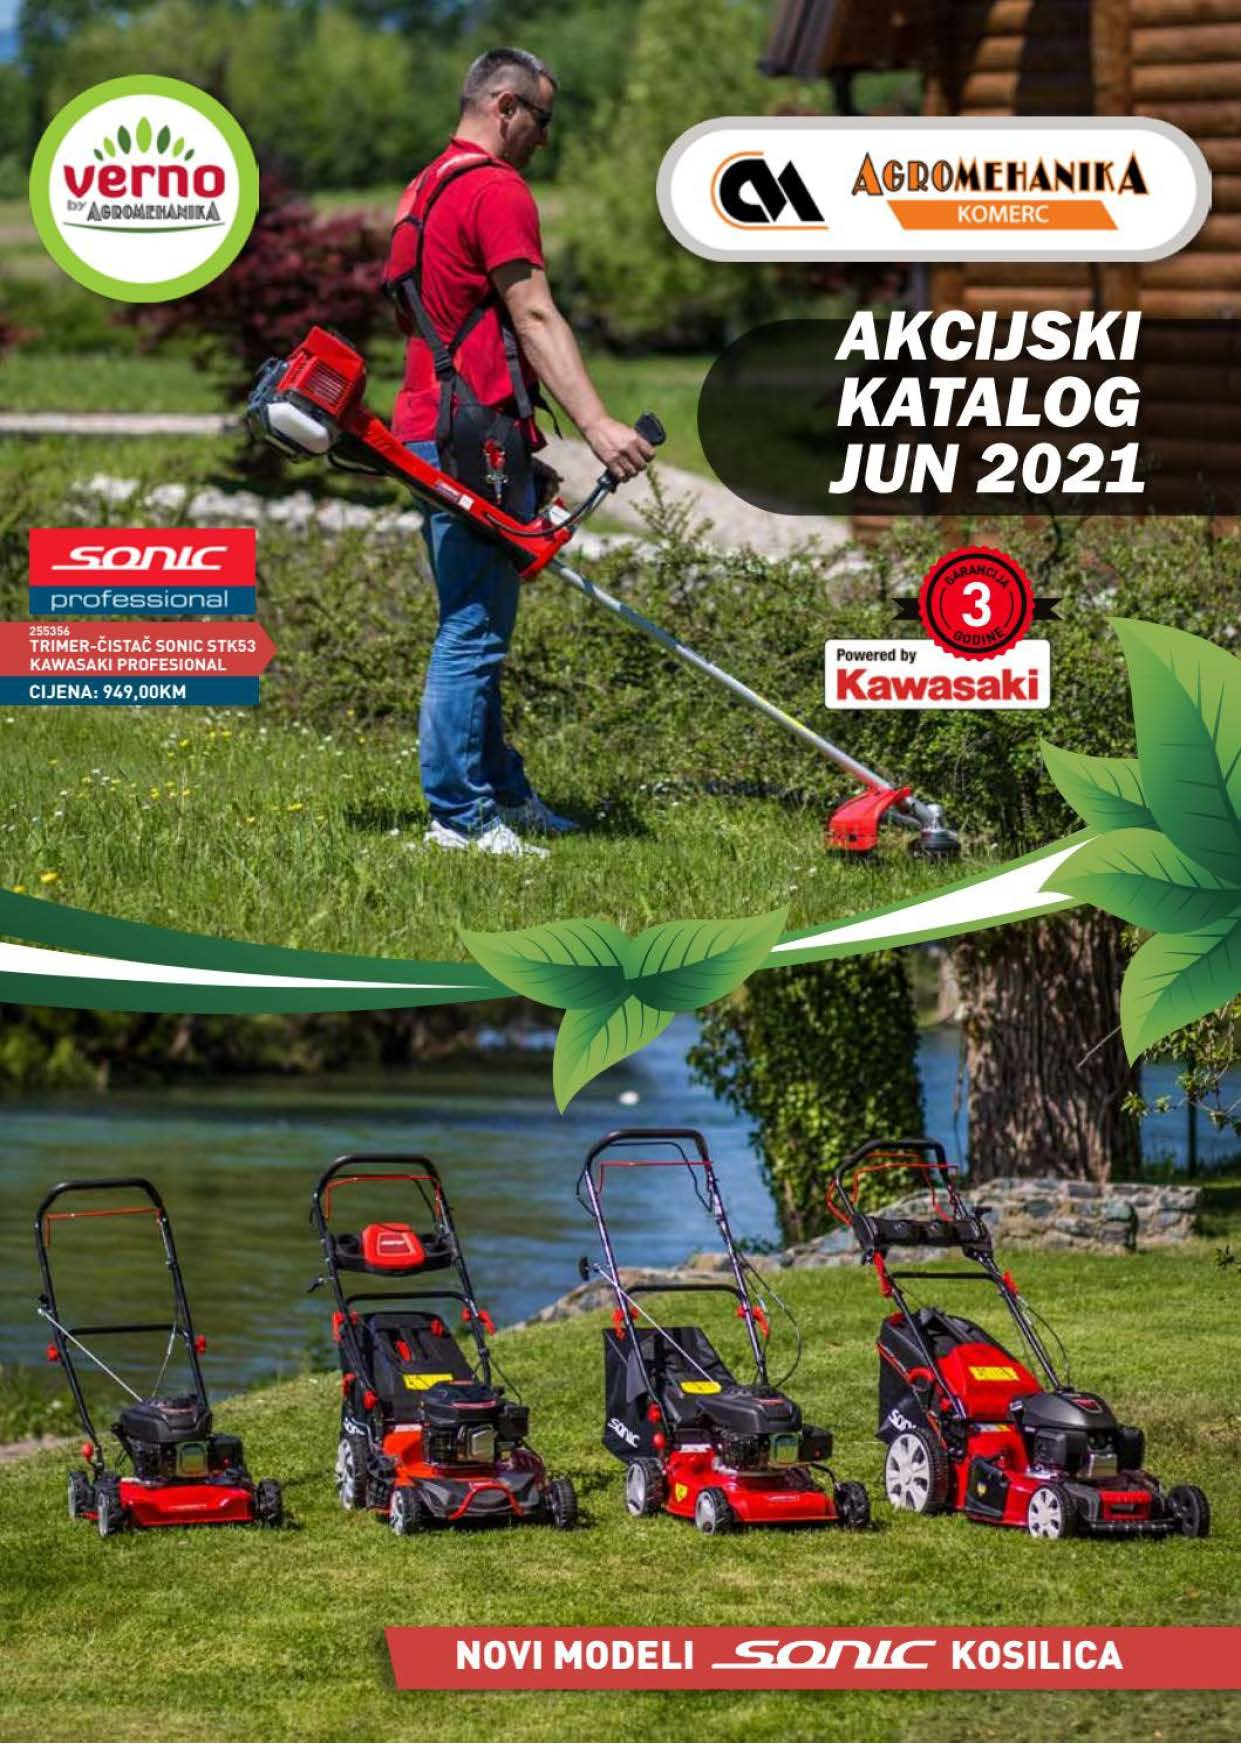 Verno Agromehanika Akcijski Katalog JUN 2021 eKatalozi.com PR Page 01